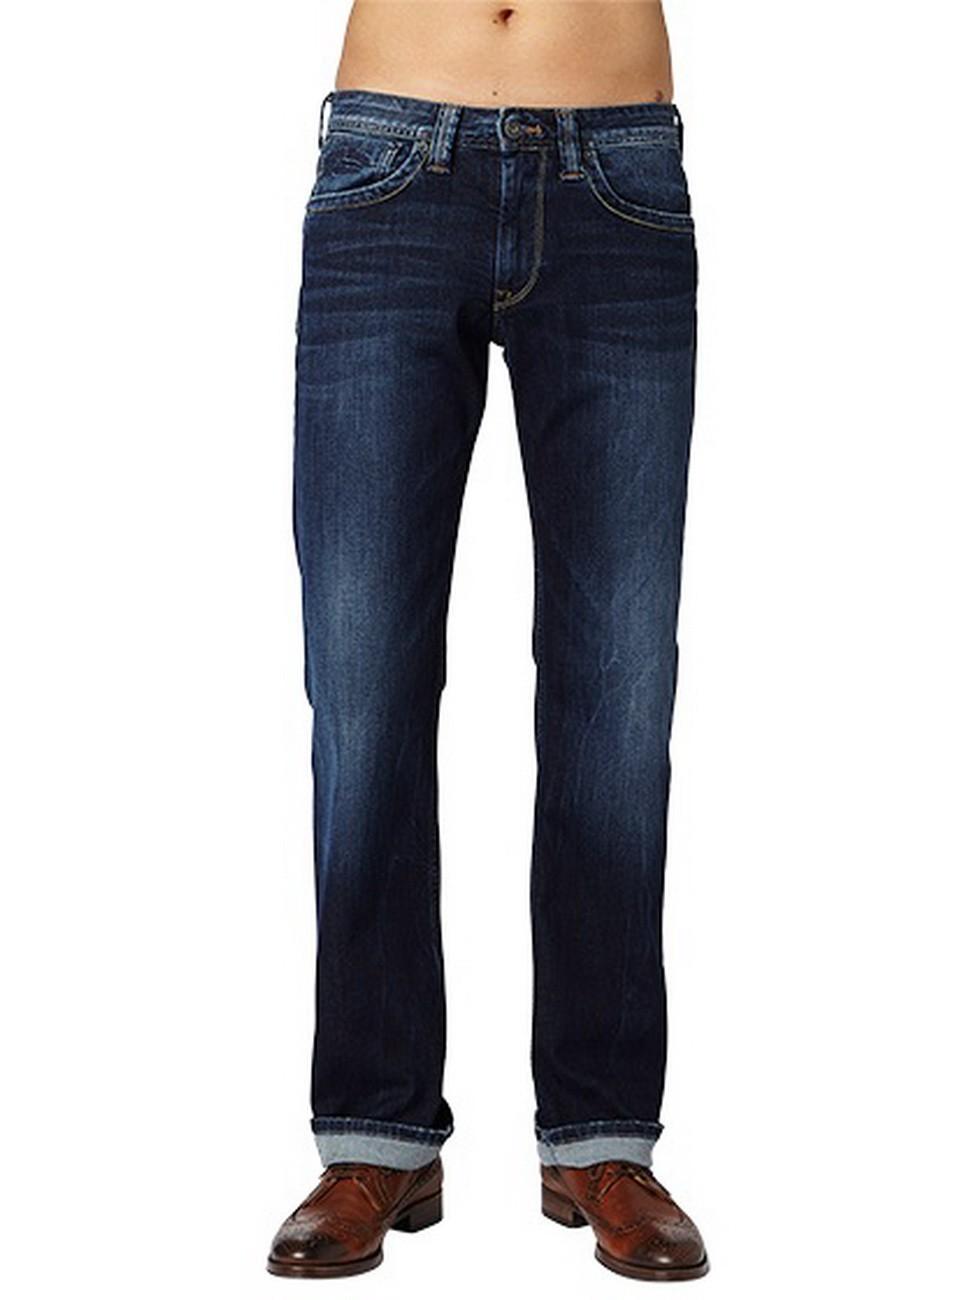 bb2e88d7d304 Pepe Jeans Mens Jeans pm200143z45 Kingston Zip Regular Fit Dark Blue ...